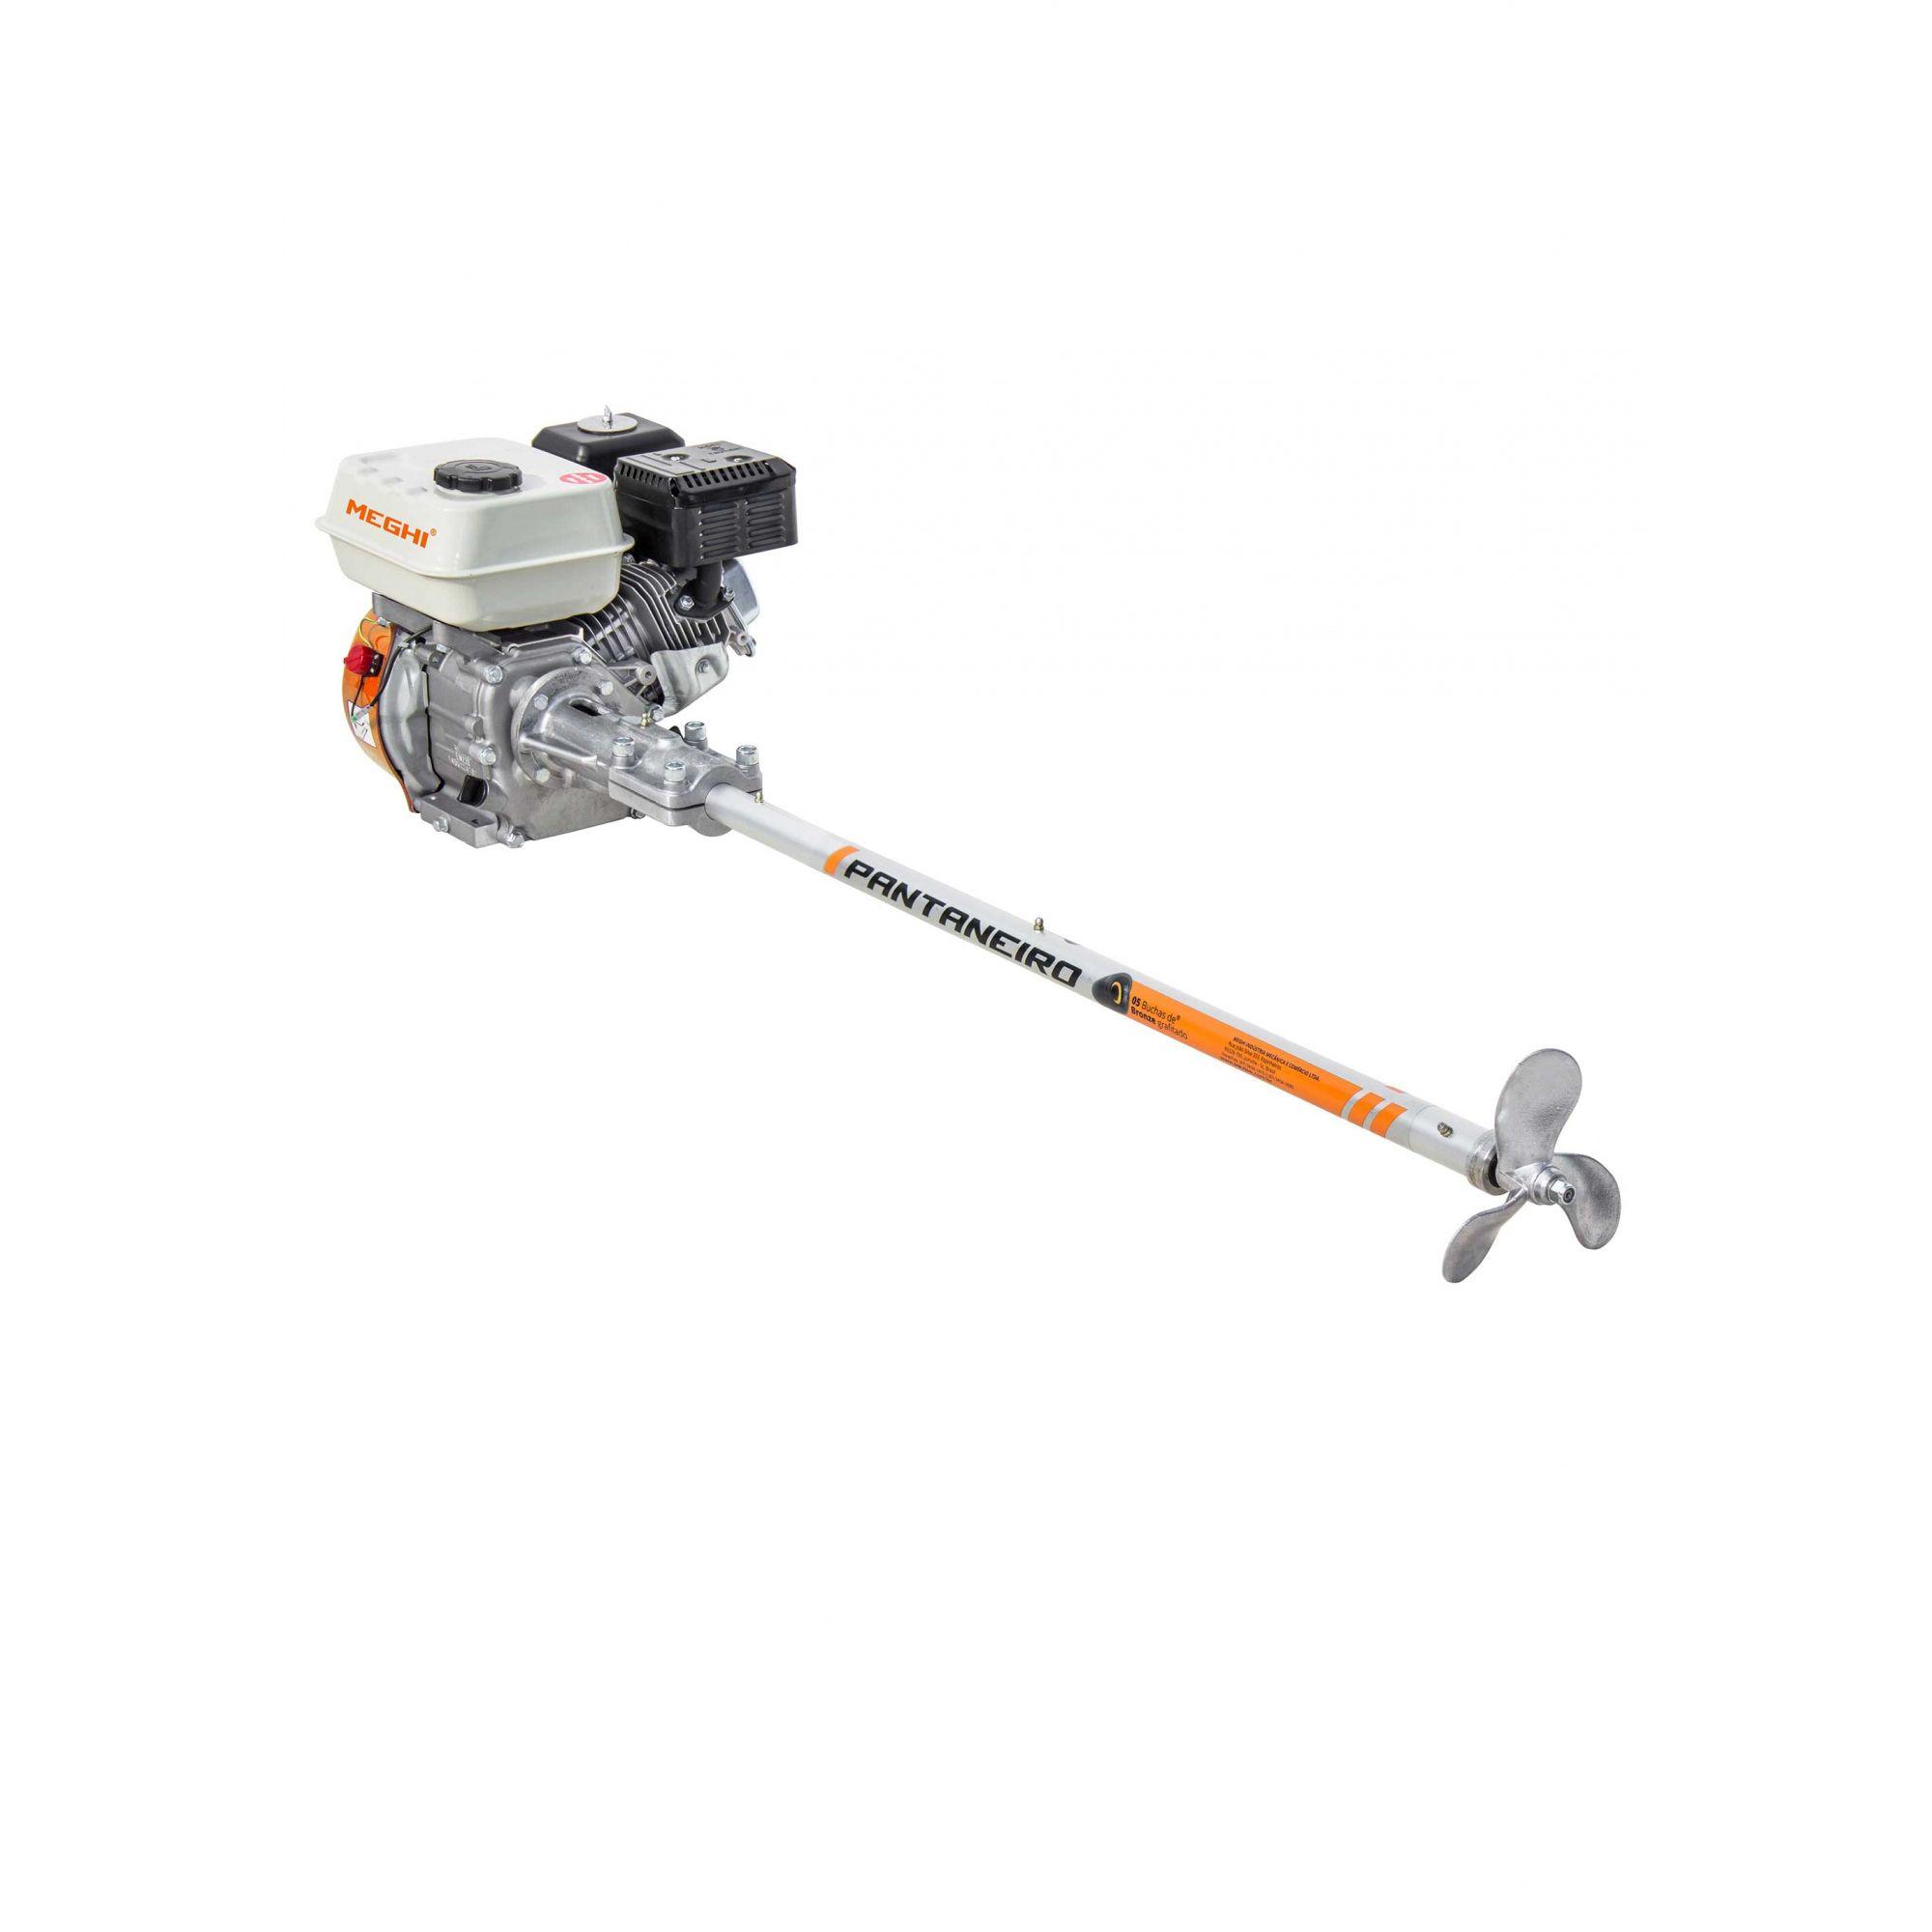 Kit Motor De Centro Barco Bote 1,70mt P/ Motor 5,5/6,5/7,0hp